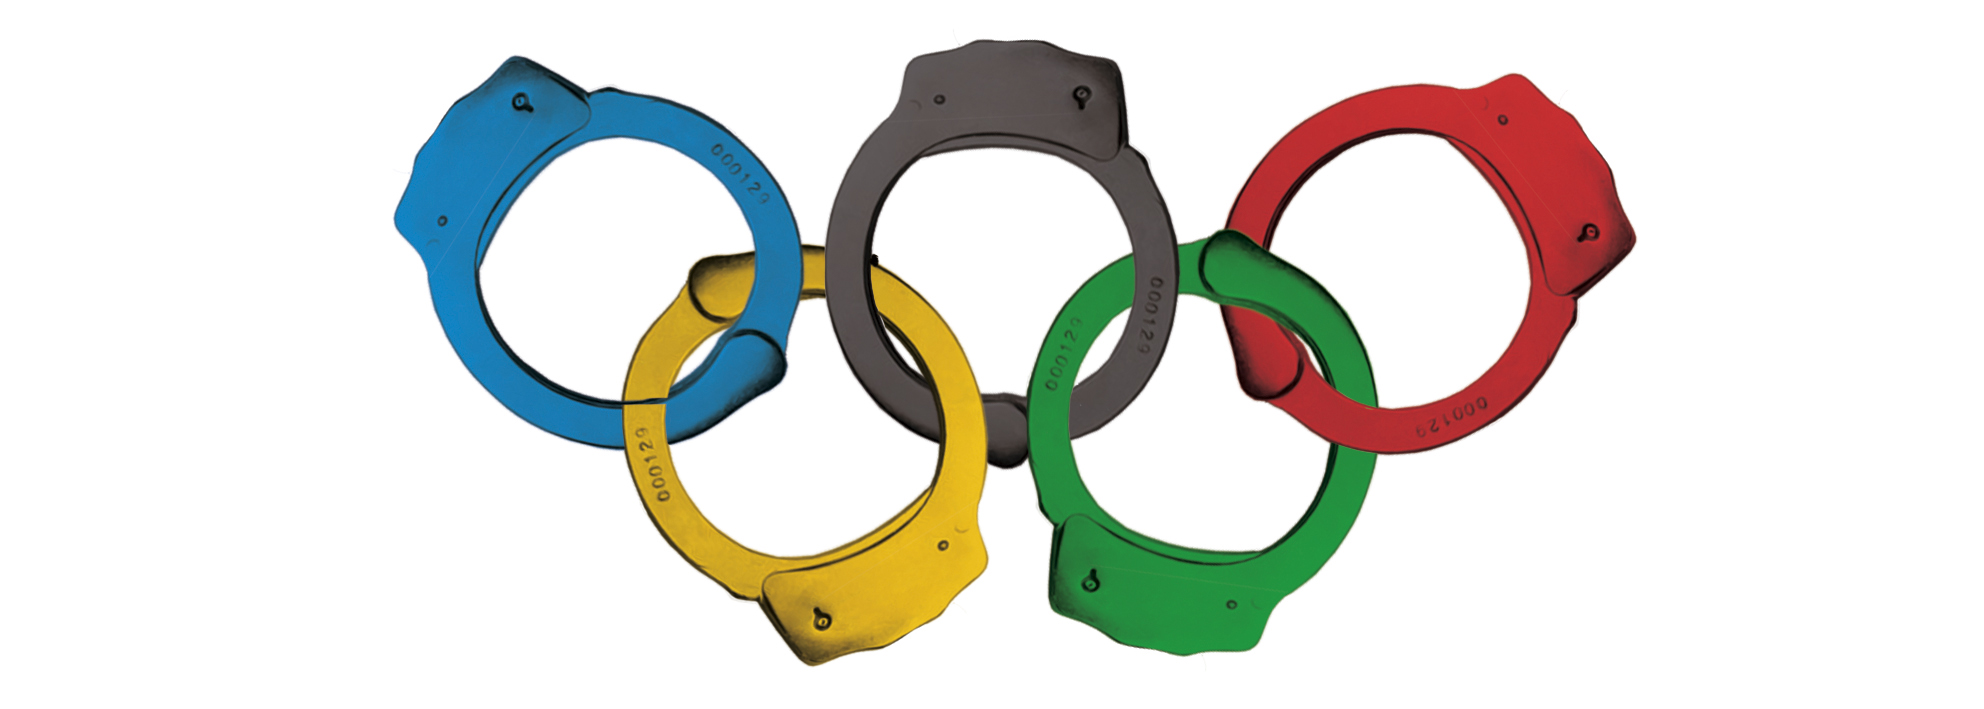 ol_handcuffs.jpg